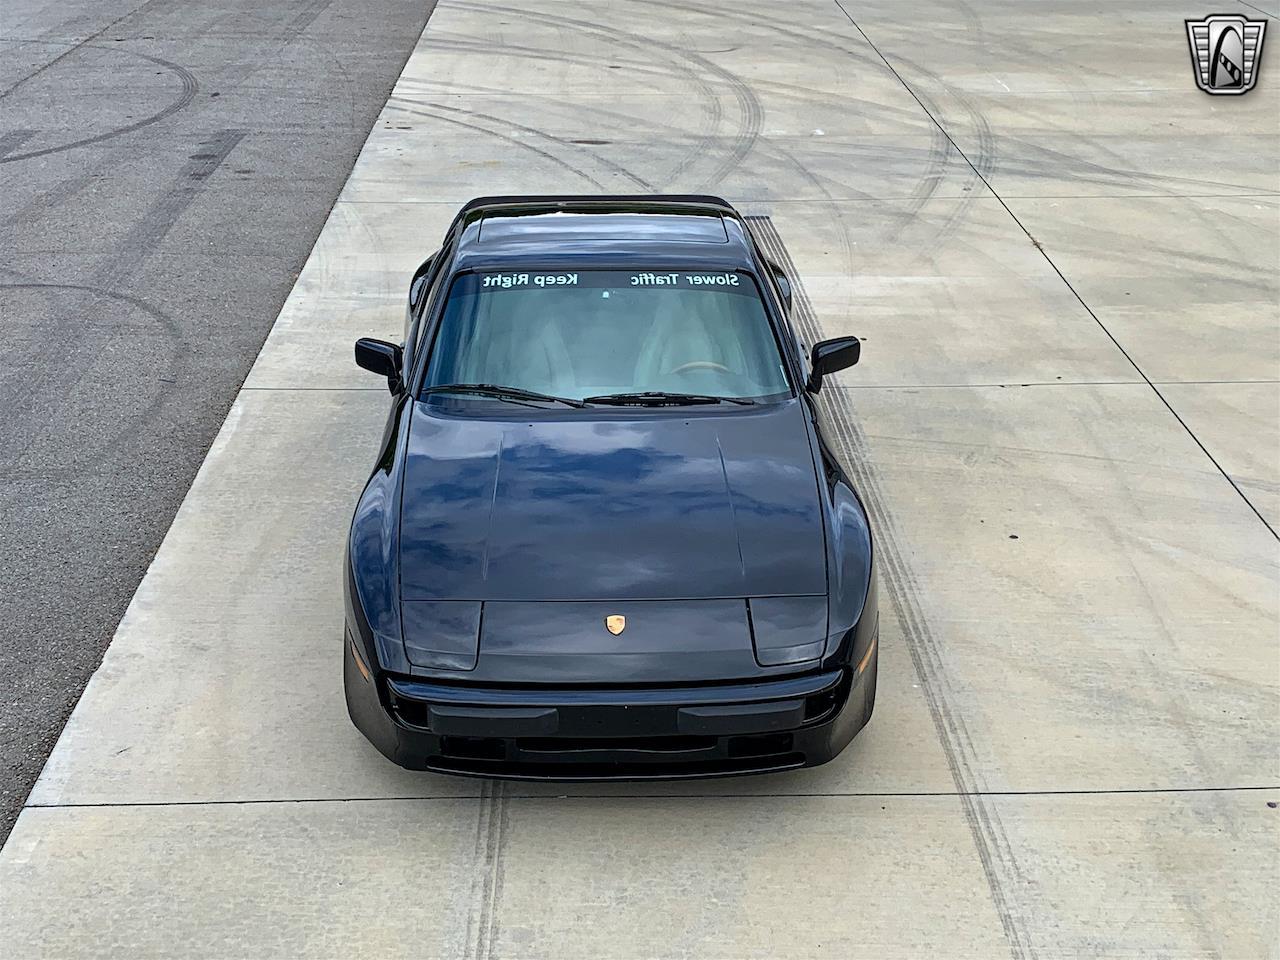 1983 Porsche 944 (CC-1340670) for sale in O'Fallon, Illinois